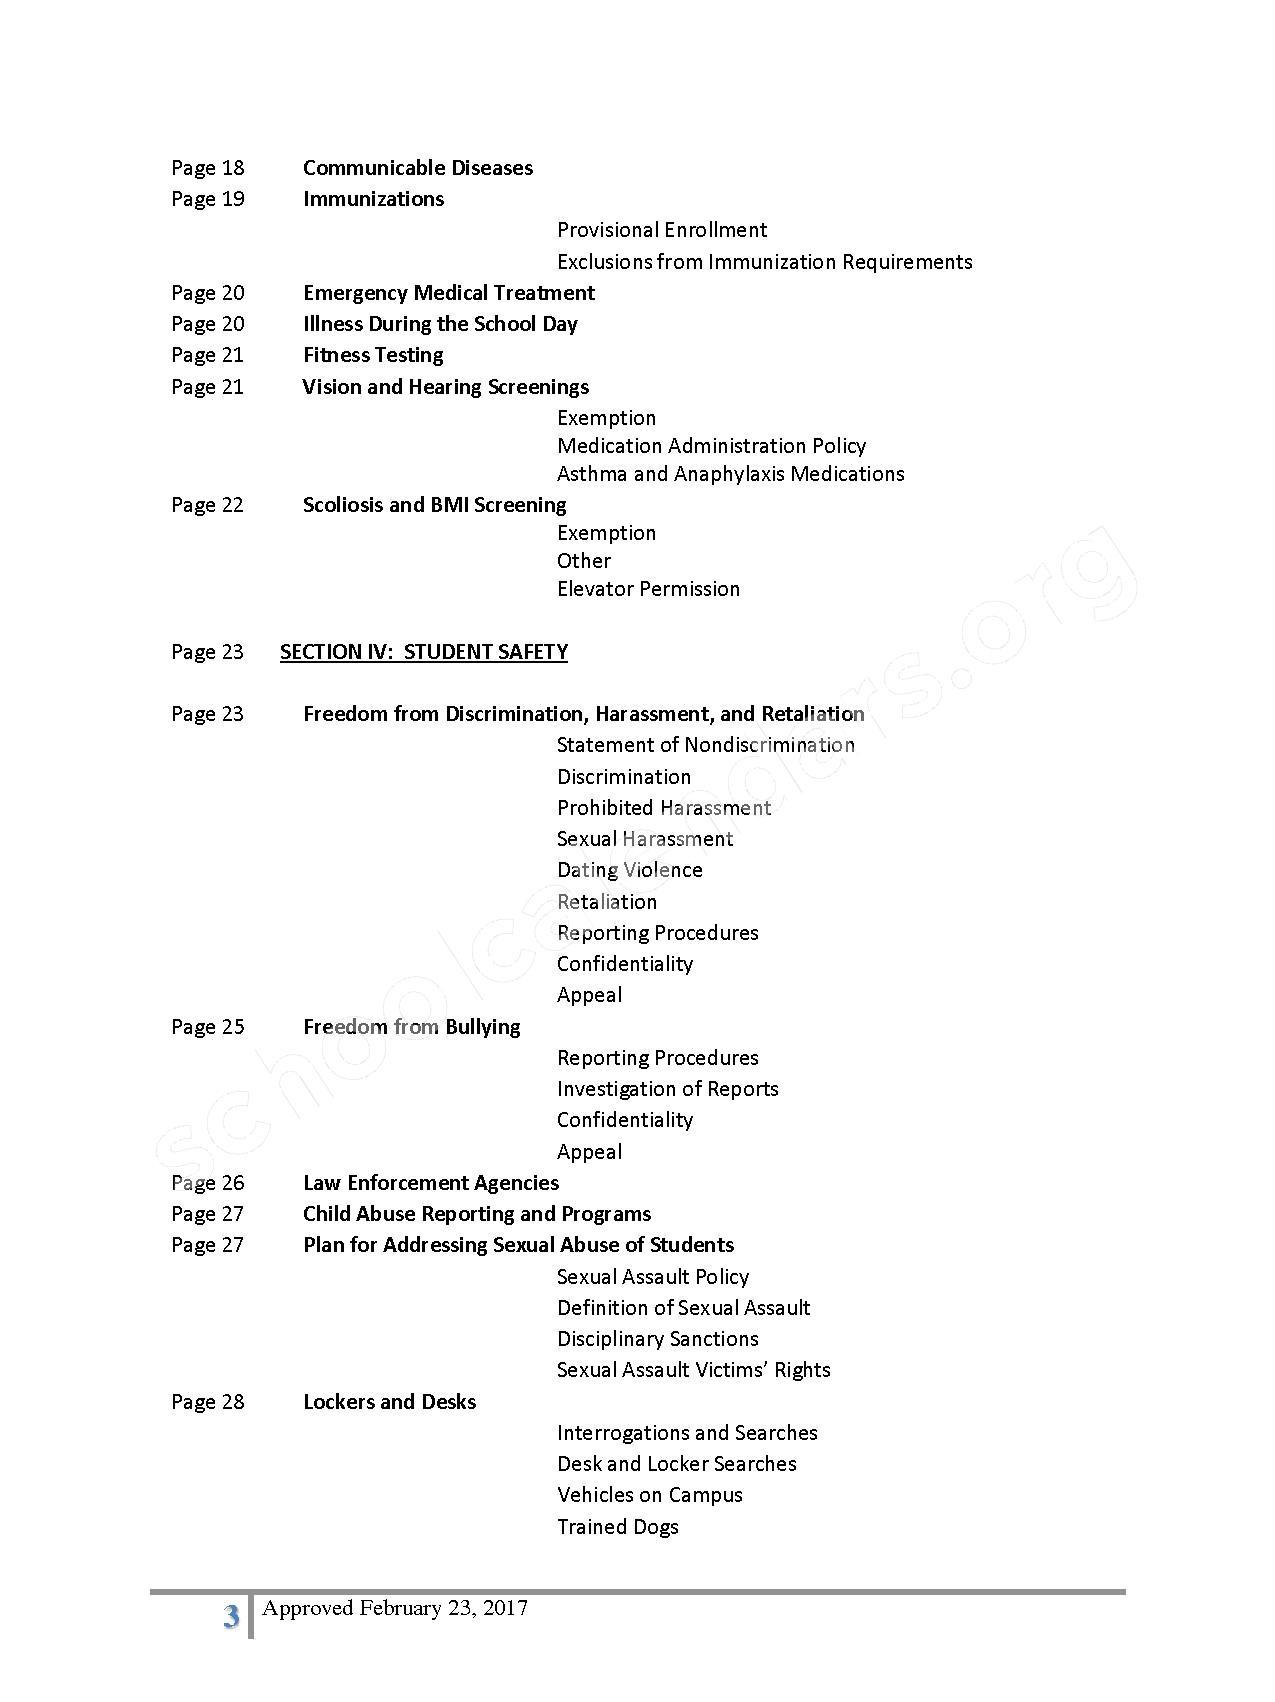 2016 - 2017 District Calendar – Lisa Academy Public Charter Schools – page 3